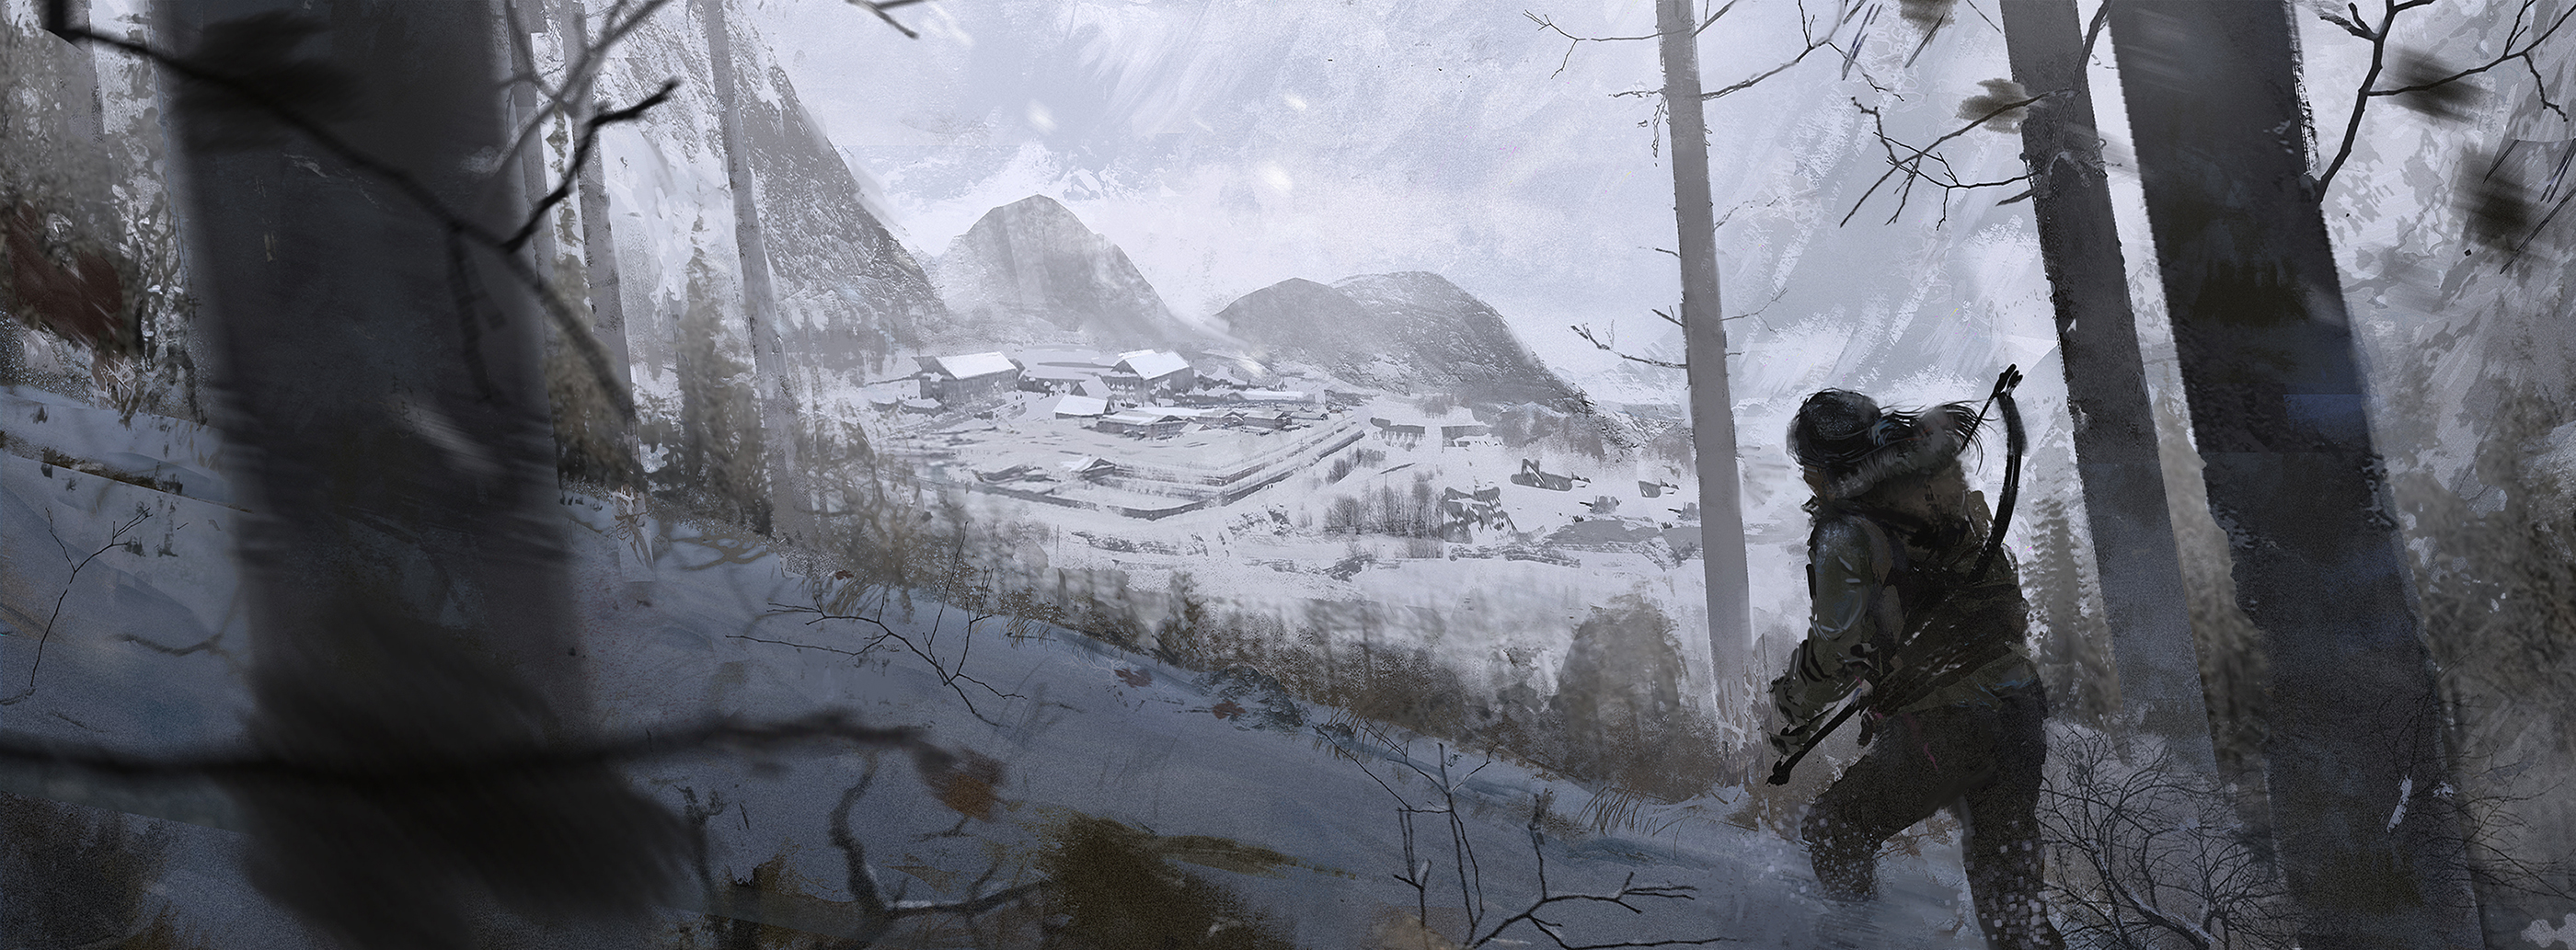 Bonusové karty a artworky z Rise of the Tomb Raider 115023